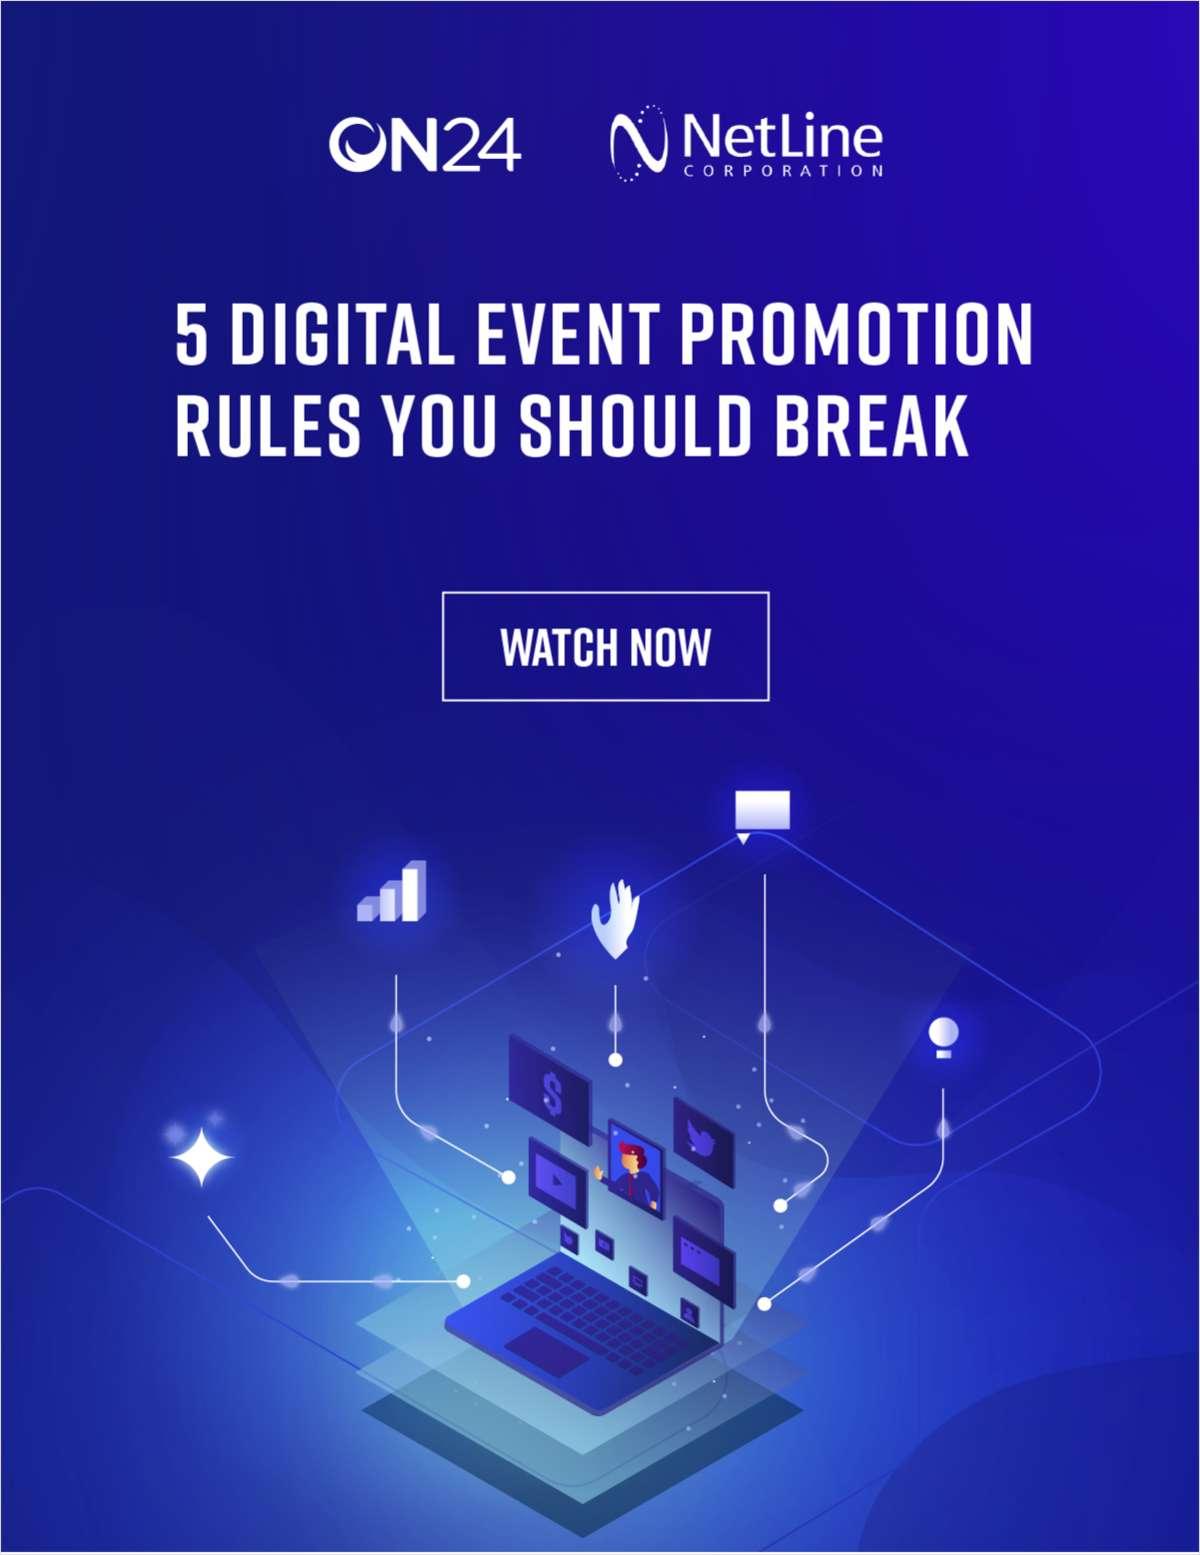 5 Digital Event Promotion Rules You Should Break